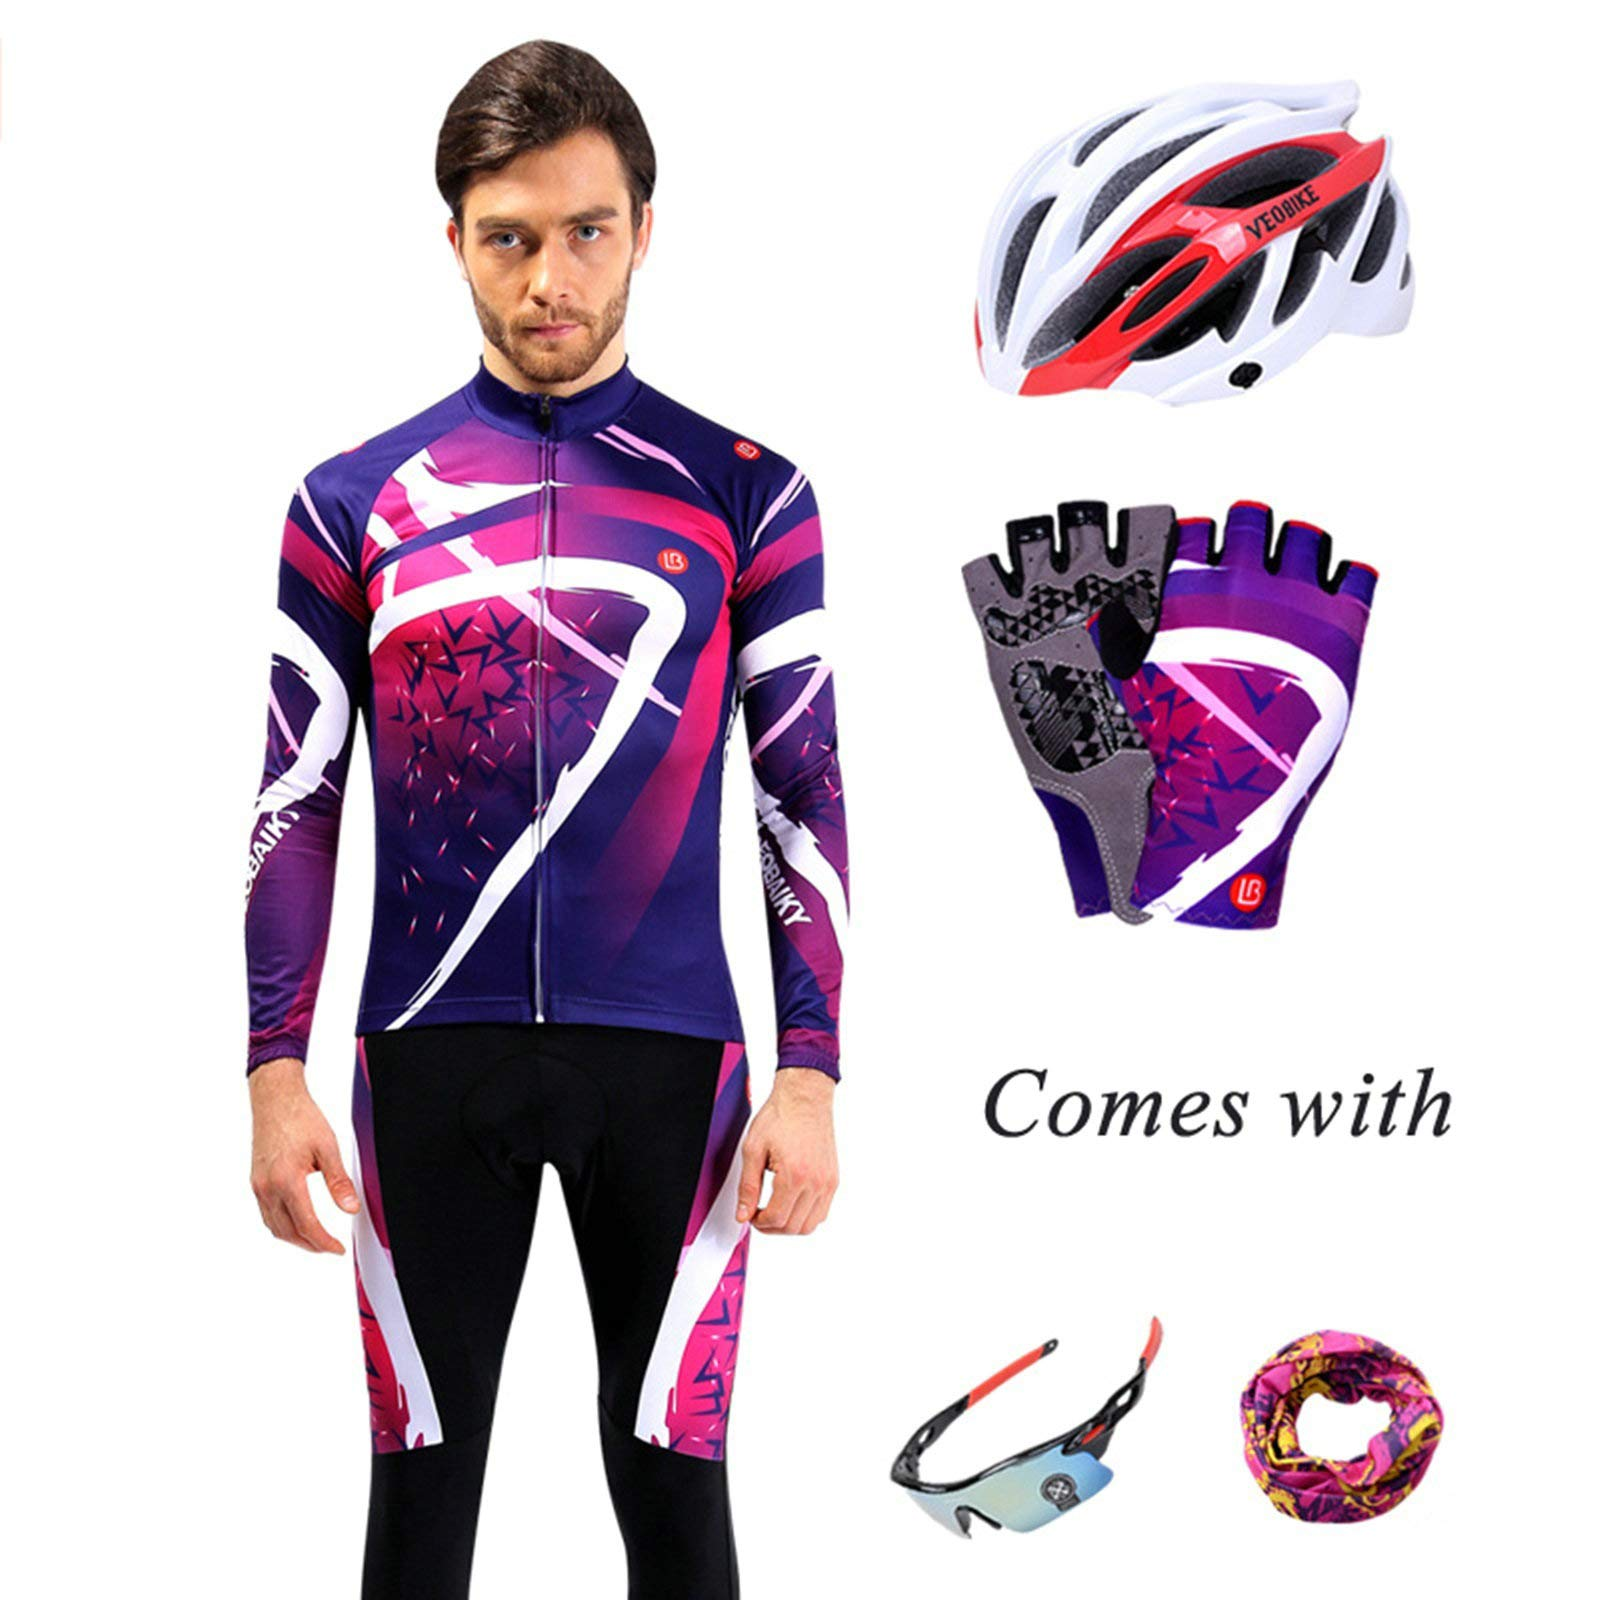 Aooaz Men's Biking Clothing Set Shirt Leggings with Helmet/Gloves/Goggles/Mask Purple S